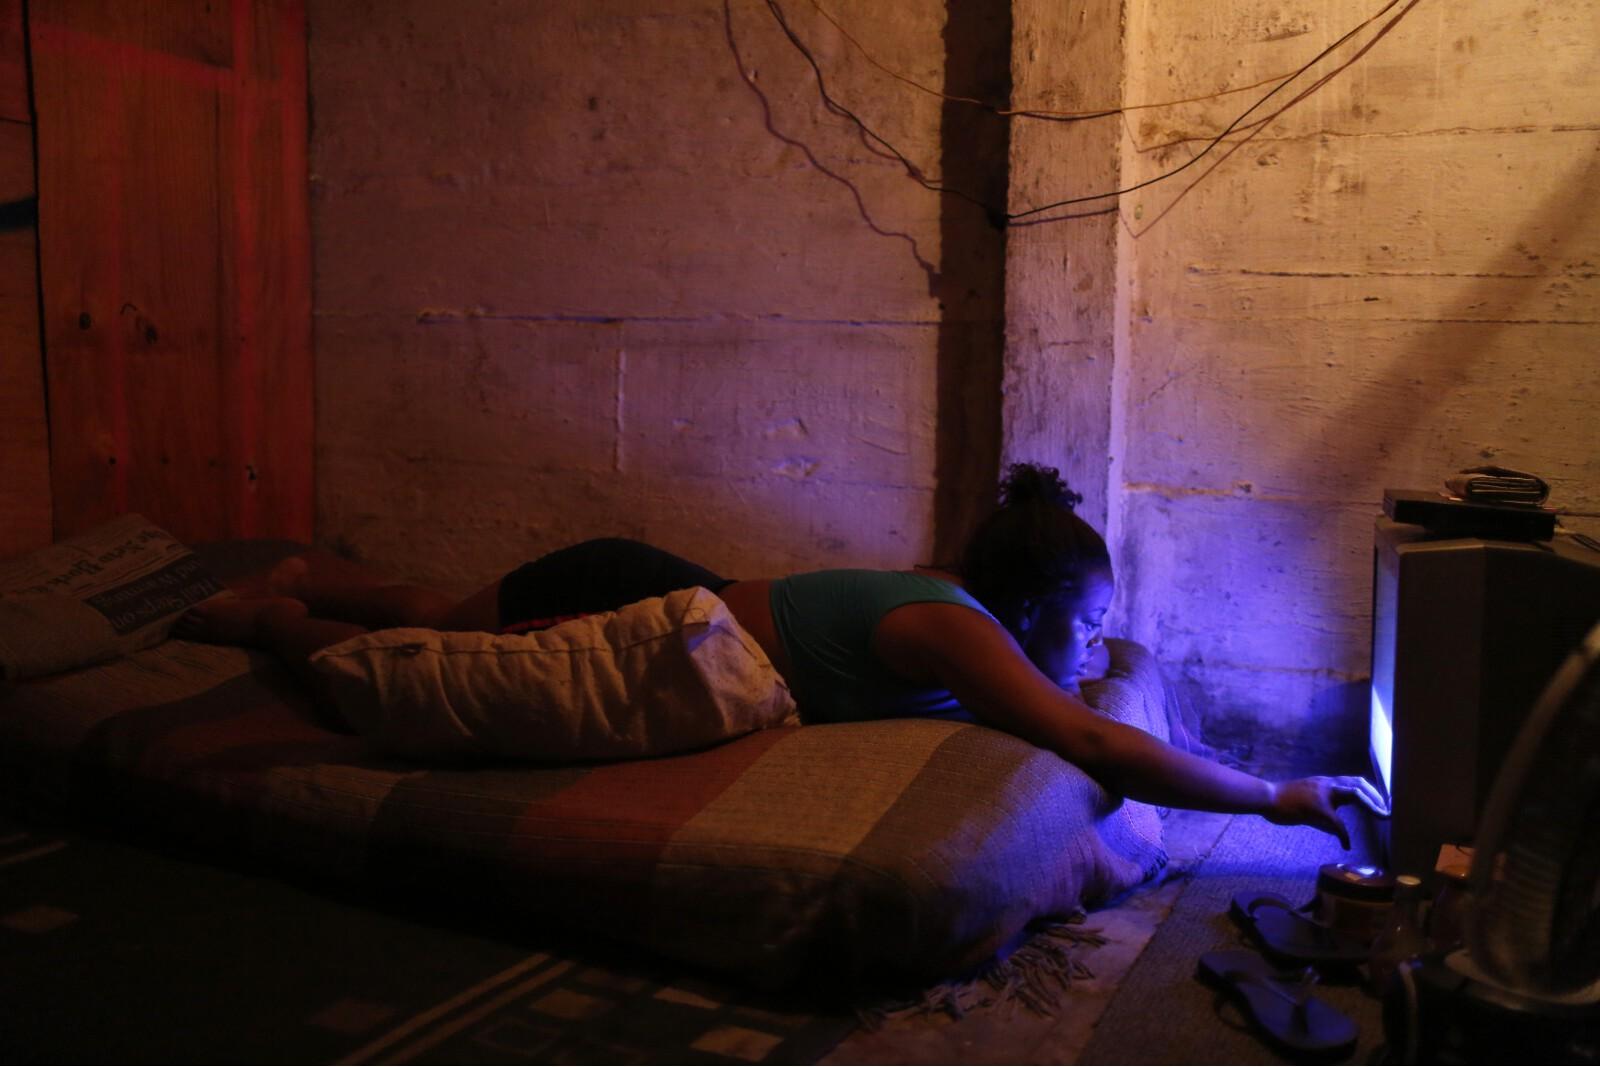 Brazil Factory Slum Woman Watching Television